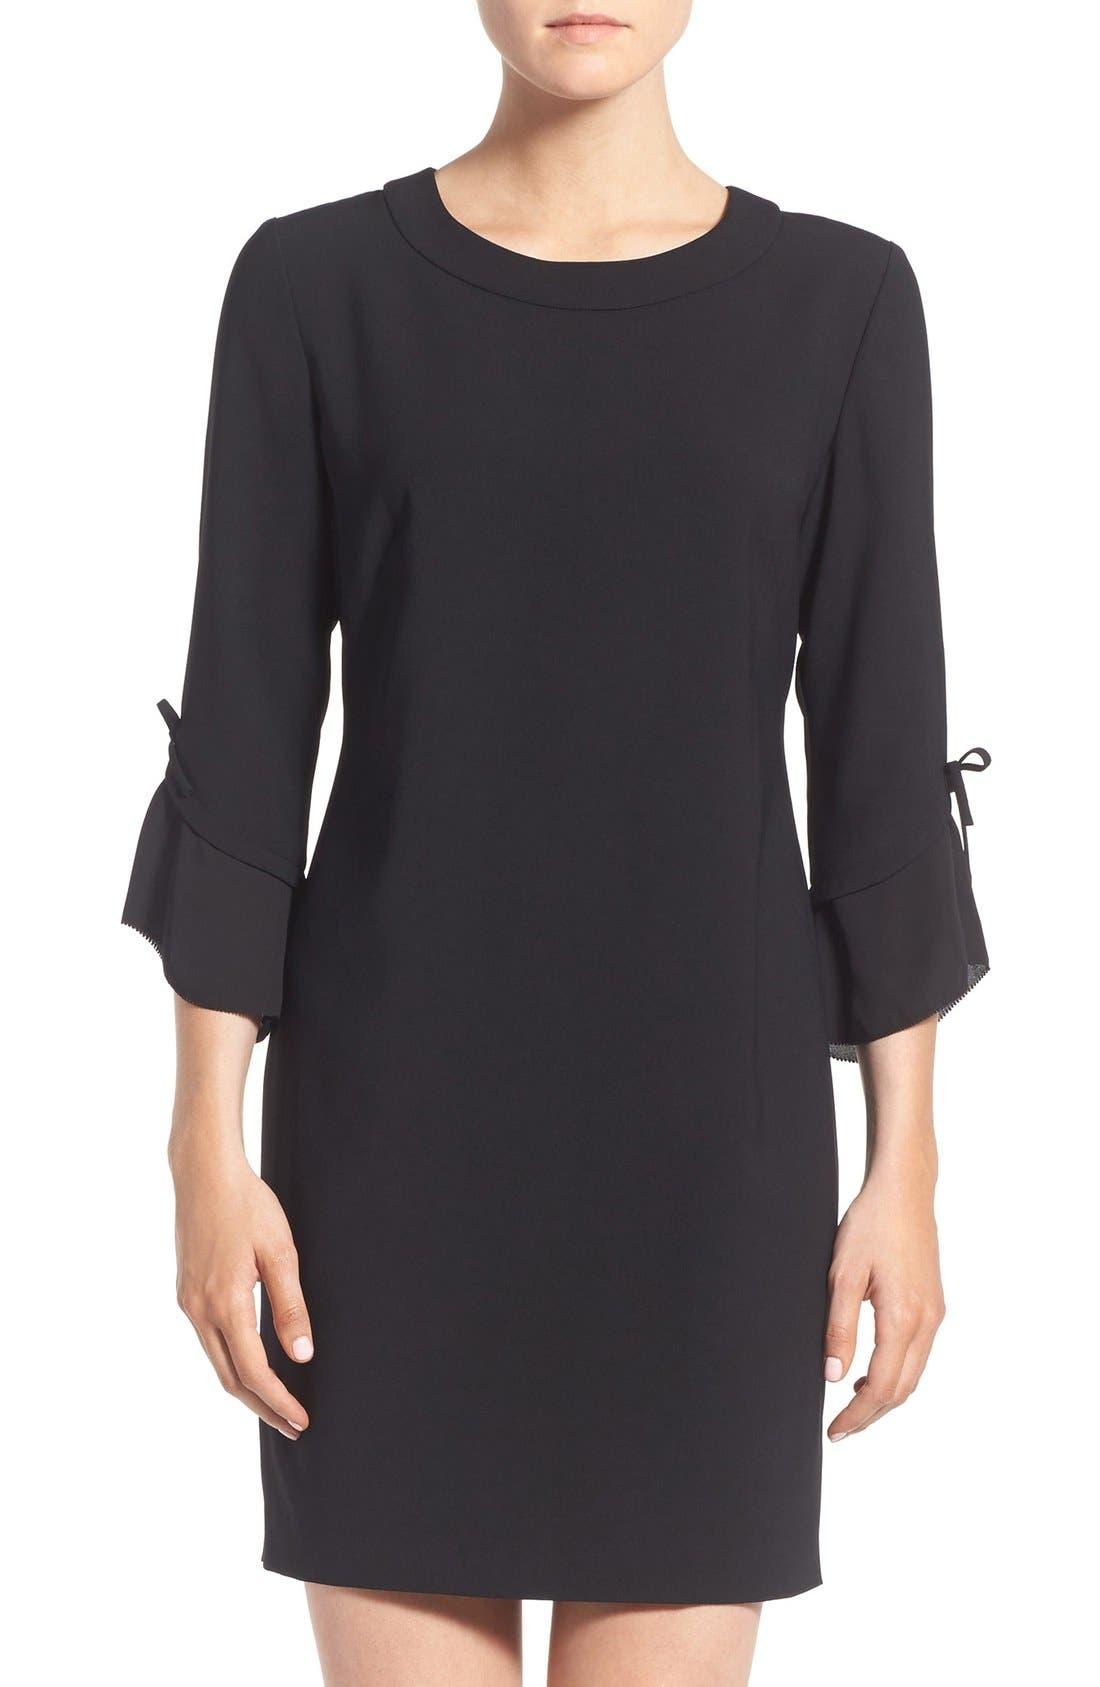 Alternate Image 1 Selected - Chelsea28 Ruffle Sleeve Sheath Dress